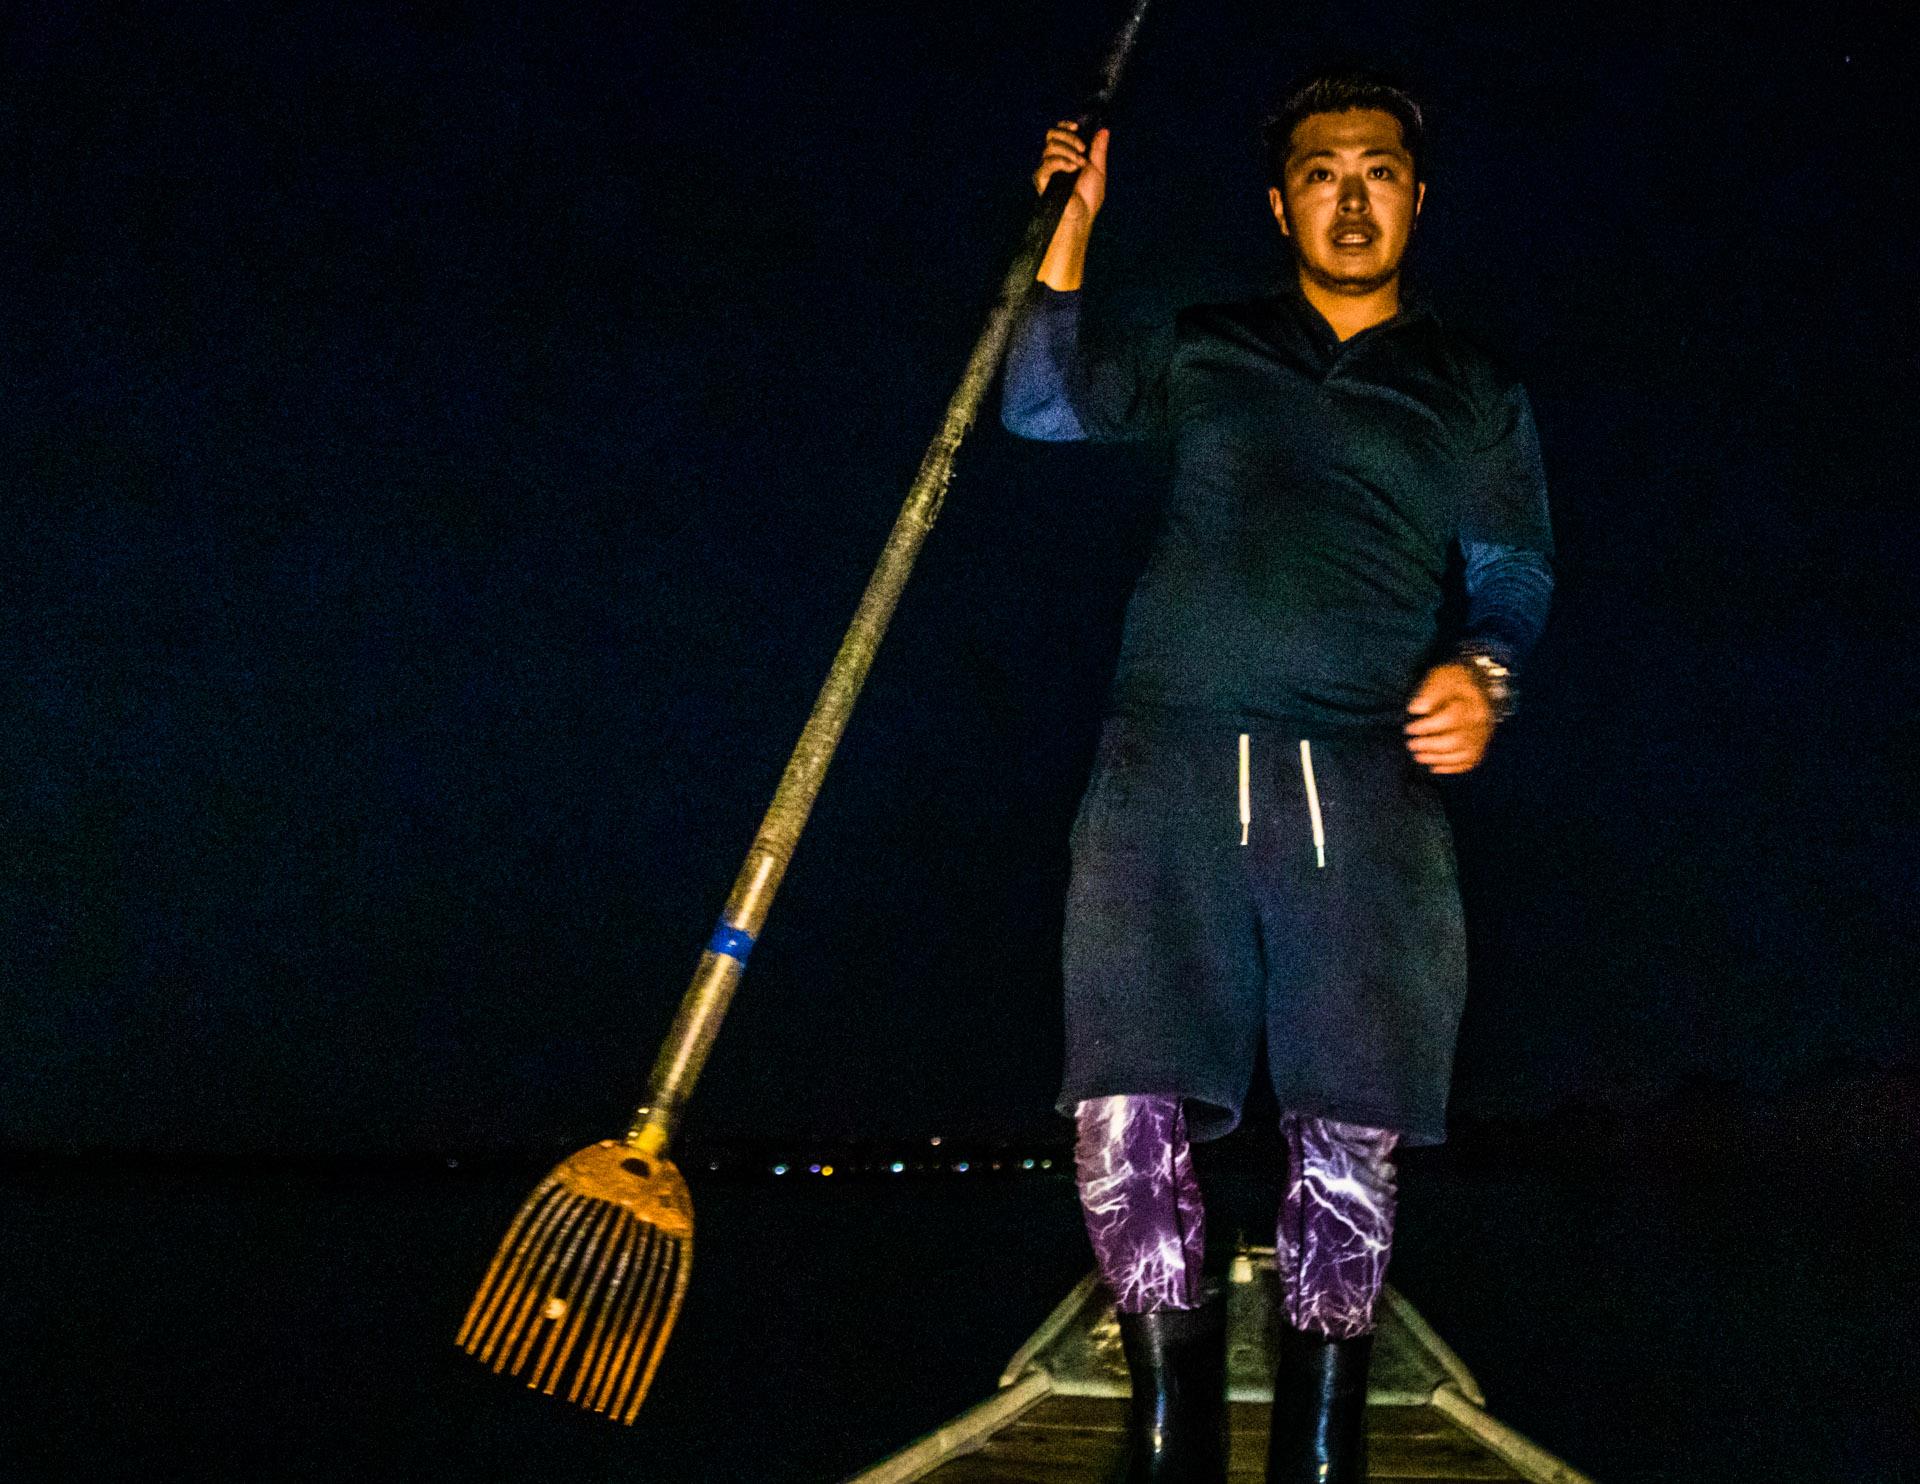 Takiya-ryo spearfishing on lake Hanama, Hamamatsu, Japan